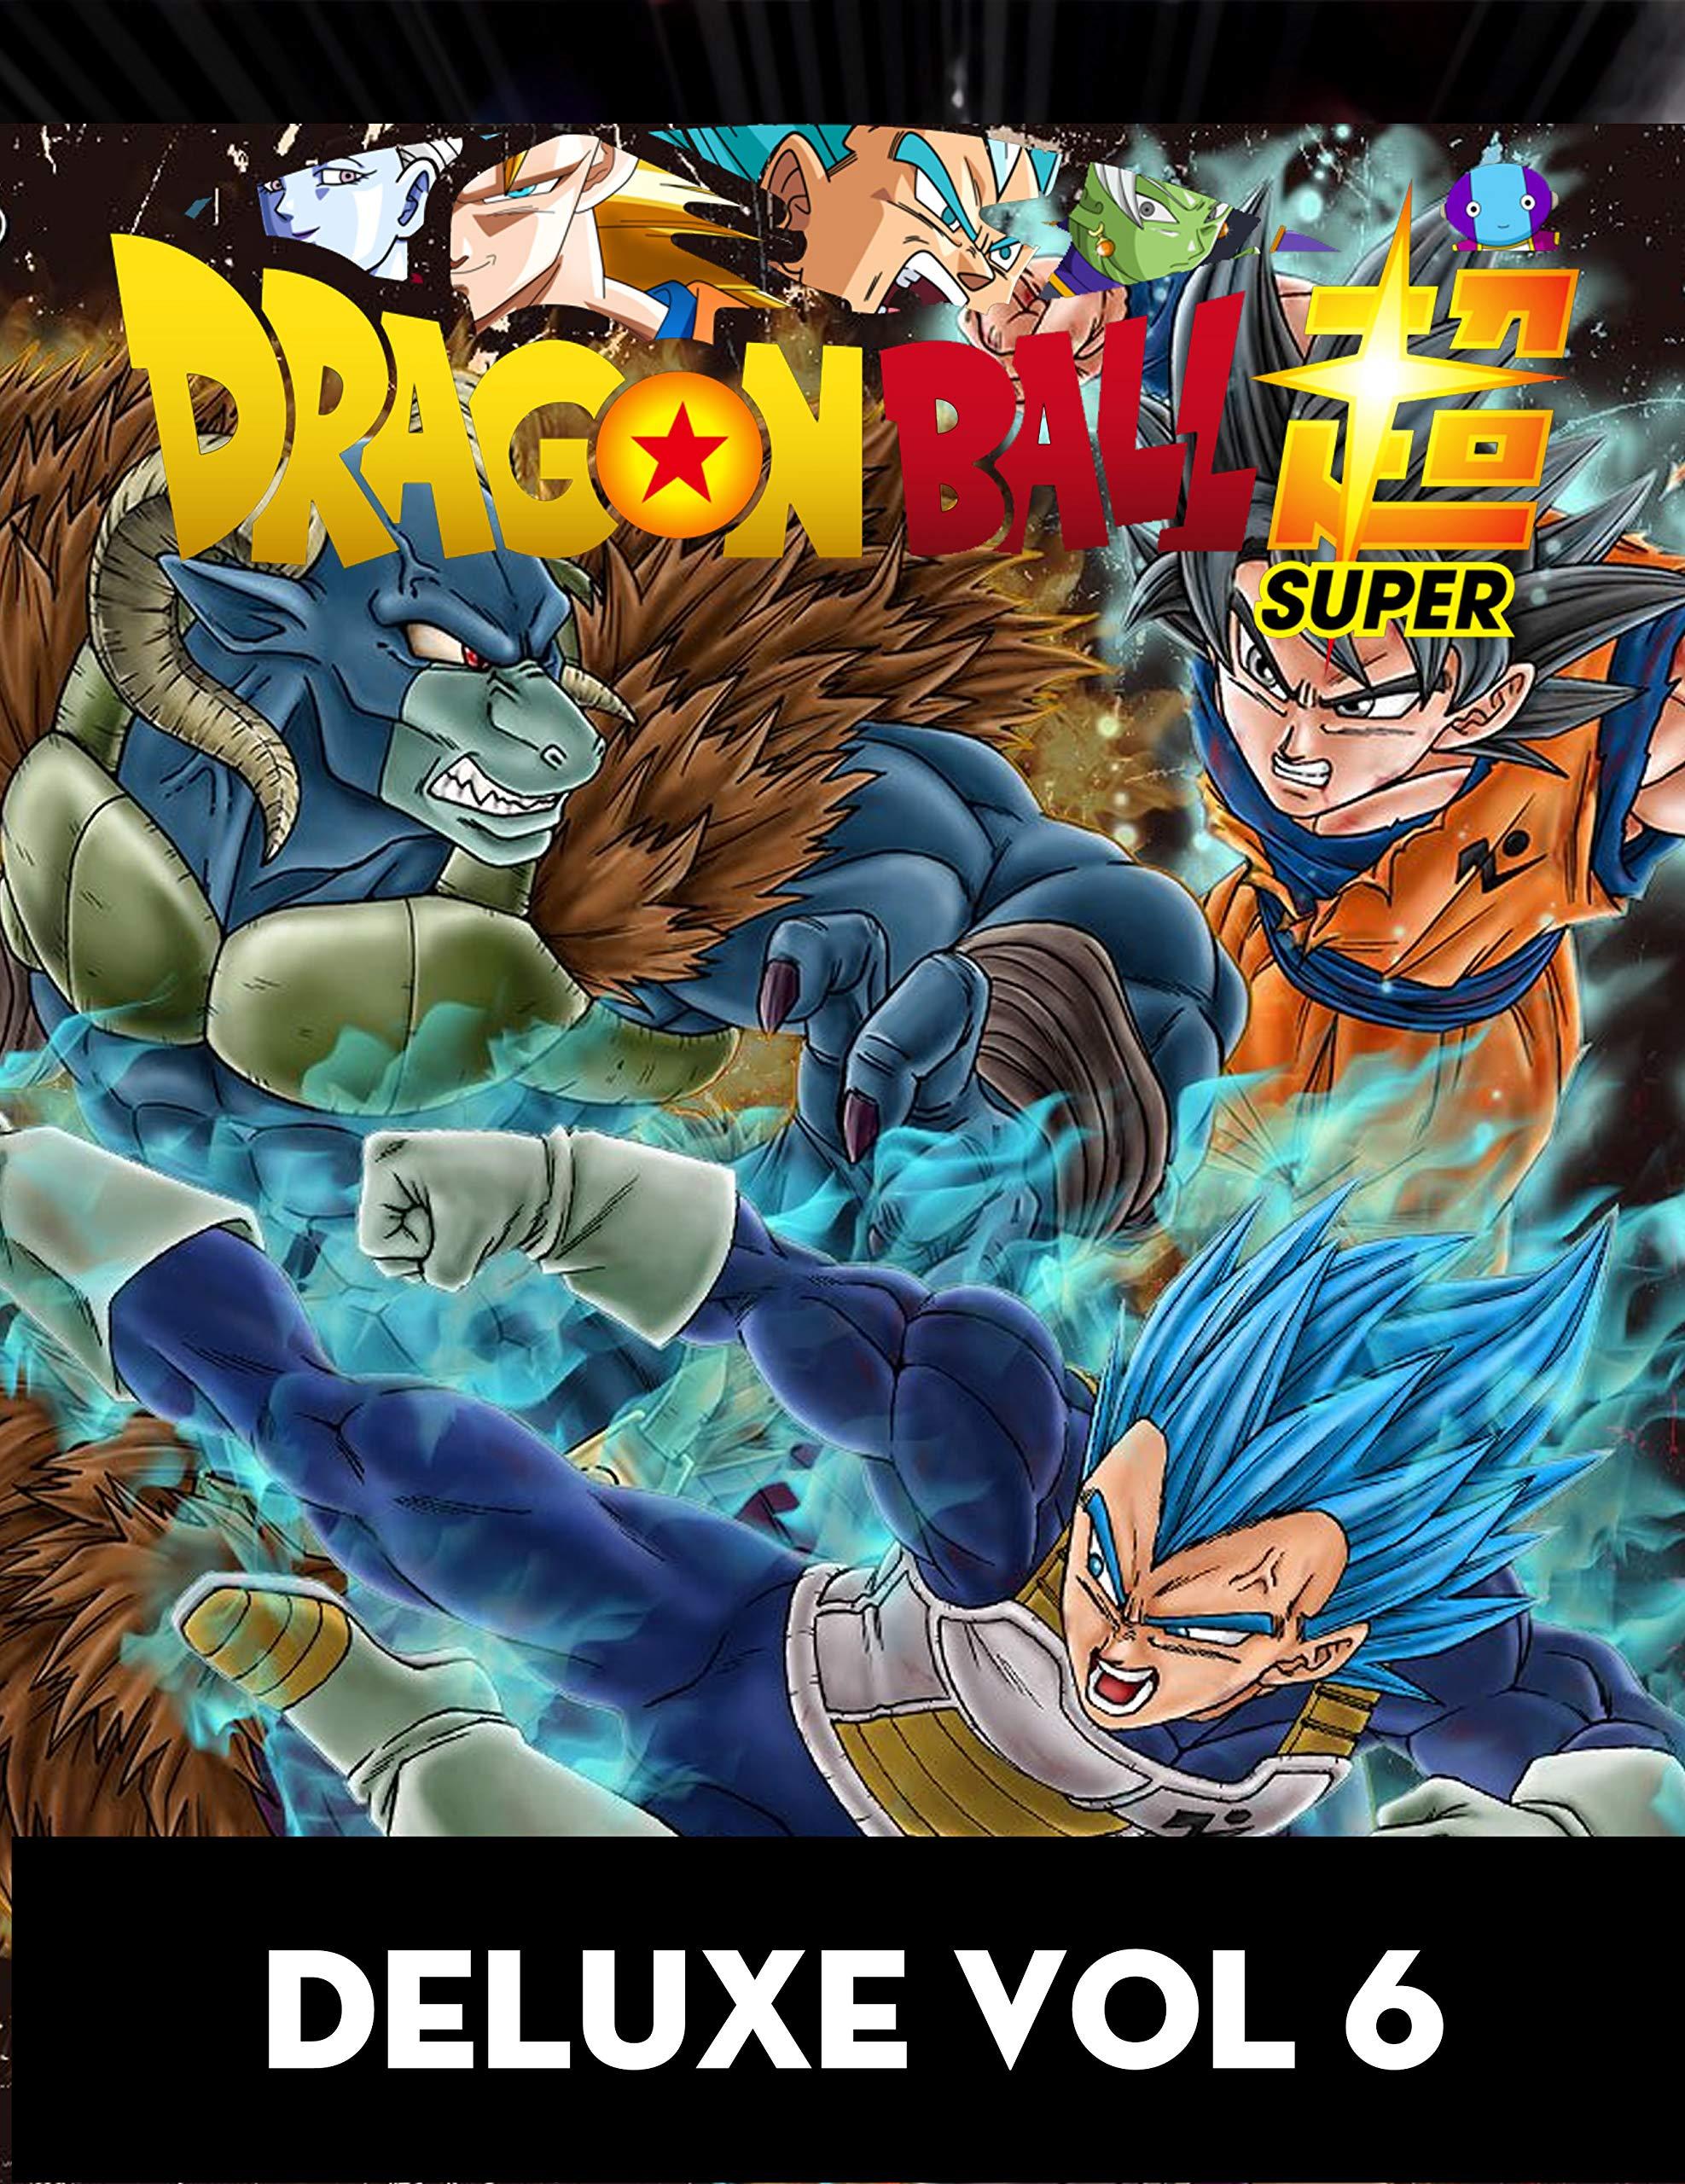 MANGA COLLECTIONS: DRAGON BALL SUPER VOL 6